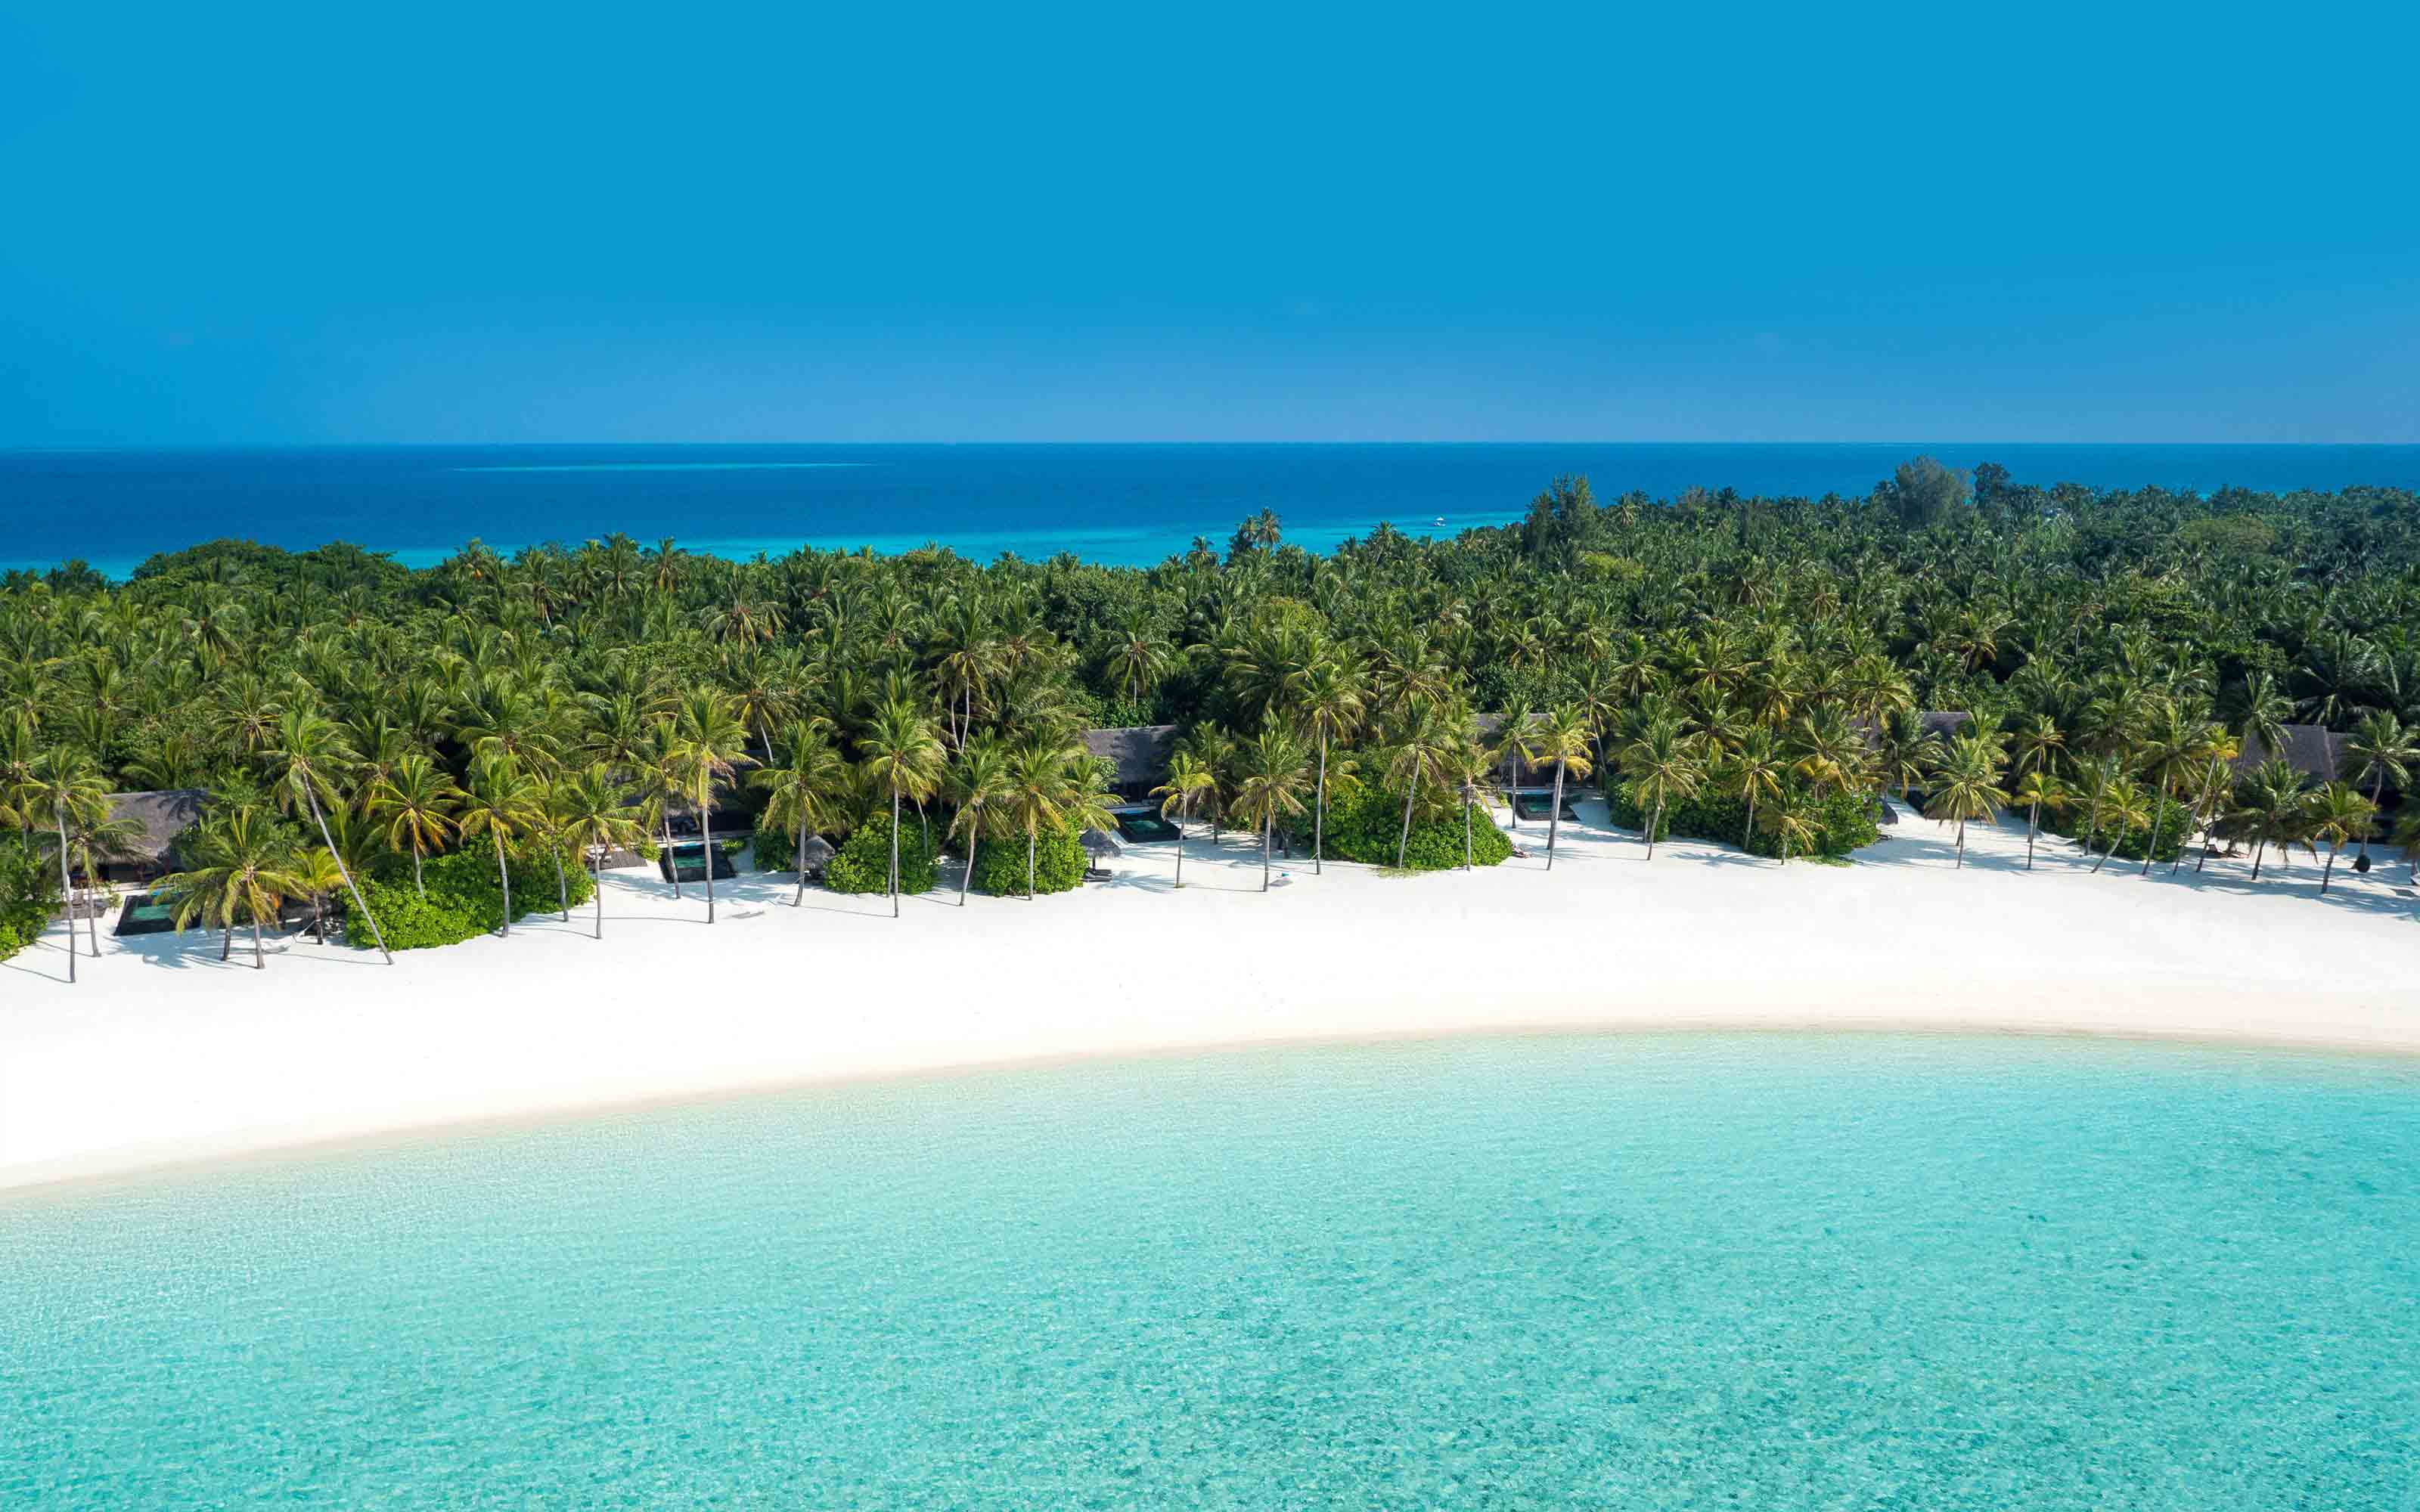 Reethi Rah Beach, The Maldives Travel Guide, best Maldives beaches, best beaches of Asia, beach travel, best hotel in the Maldives, best restaurants in the Maldives, best nightlife in the Maldives, Maldives beaches, Maldives luxury resorts